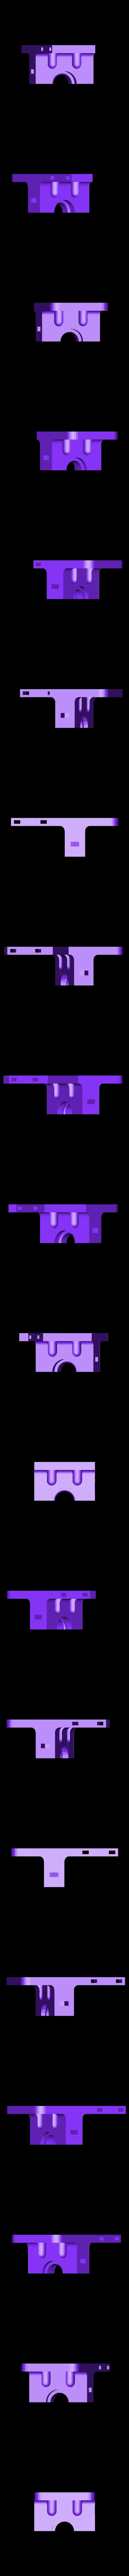 bMGN9H_for_e3d_v6_base_v1.stl Download free STL file Holder for e3d v6 hotend to MGN9H carrier • Design to 3D print, tigorlab